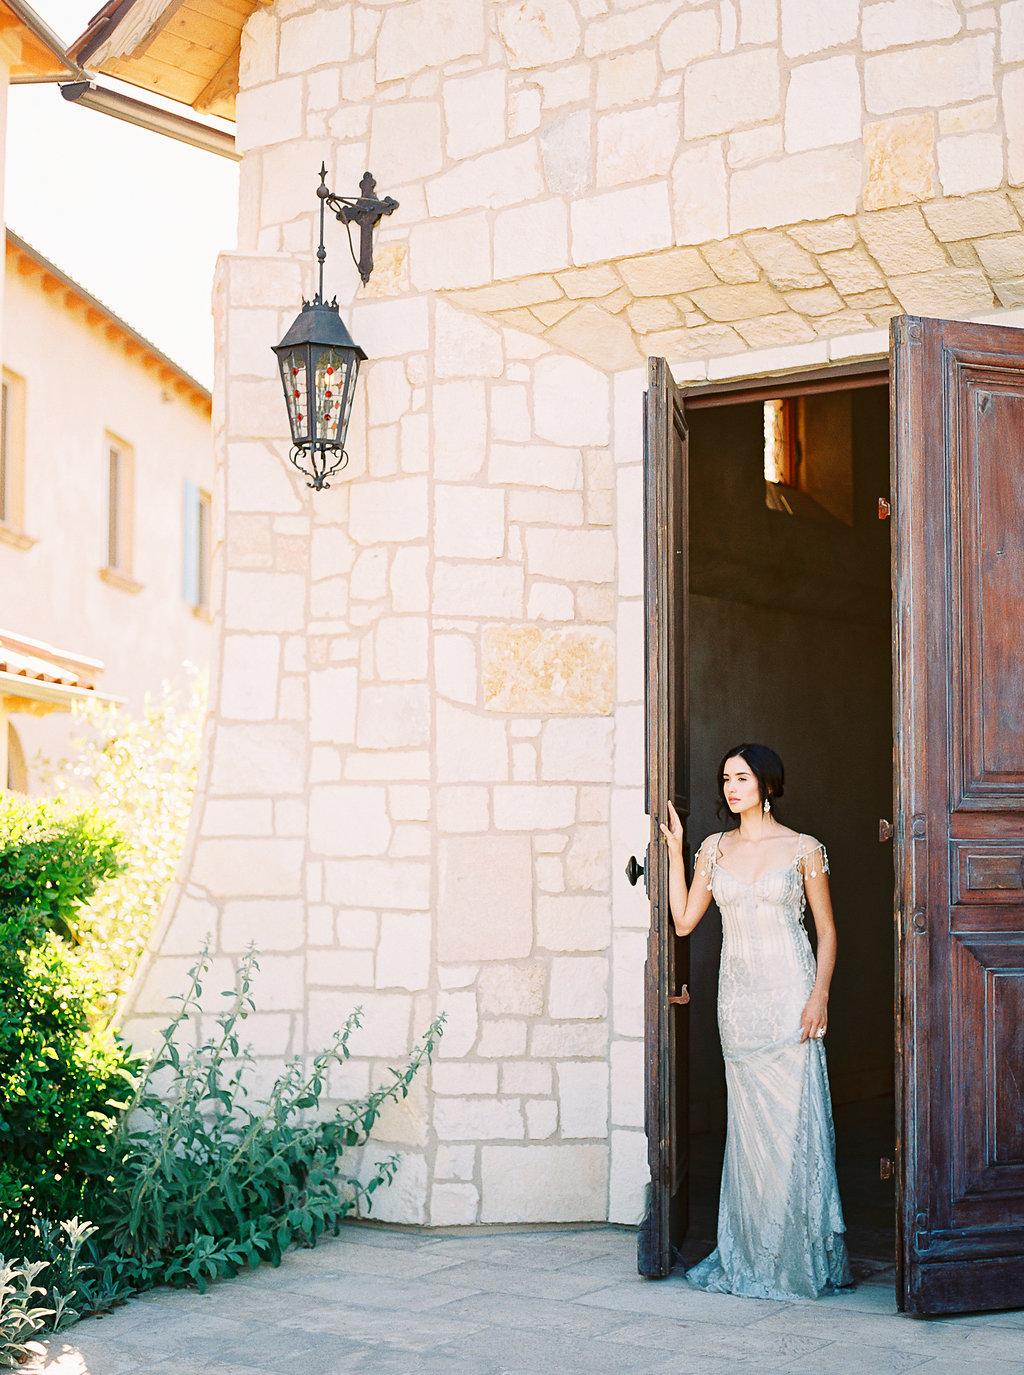 Paso Robles California - Allegretto Resort and Vineyards - Bridal Session - fine art film photographer Tanja Kibogo13.JPG